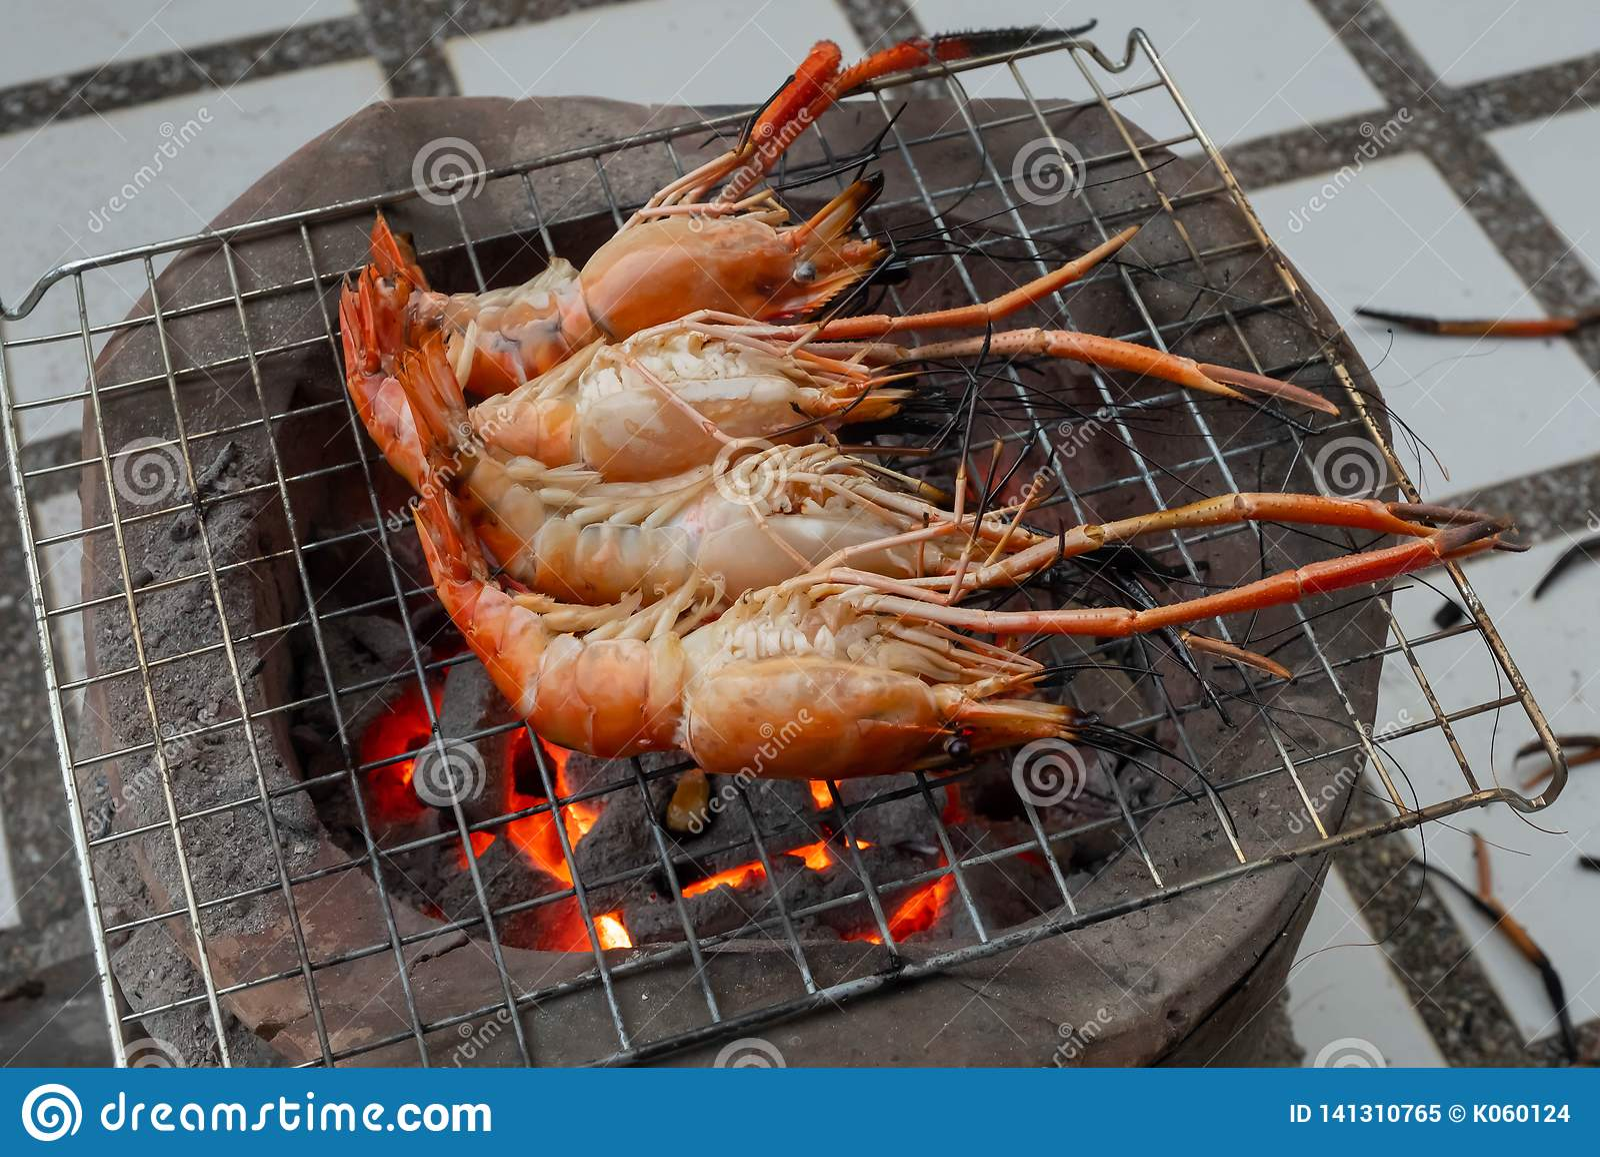 Piec na grillu krewetka na ogieniu